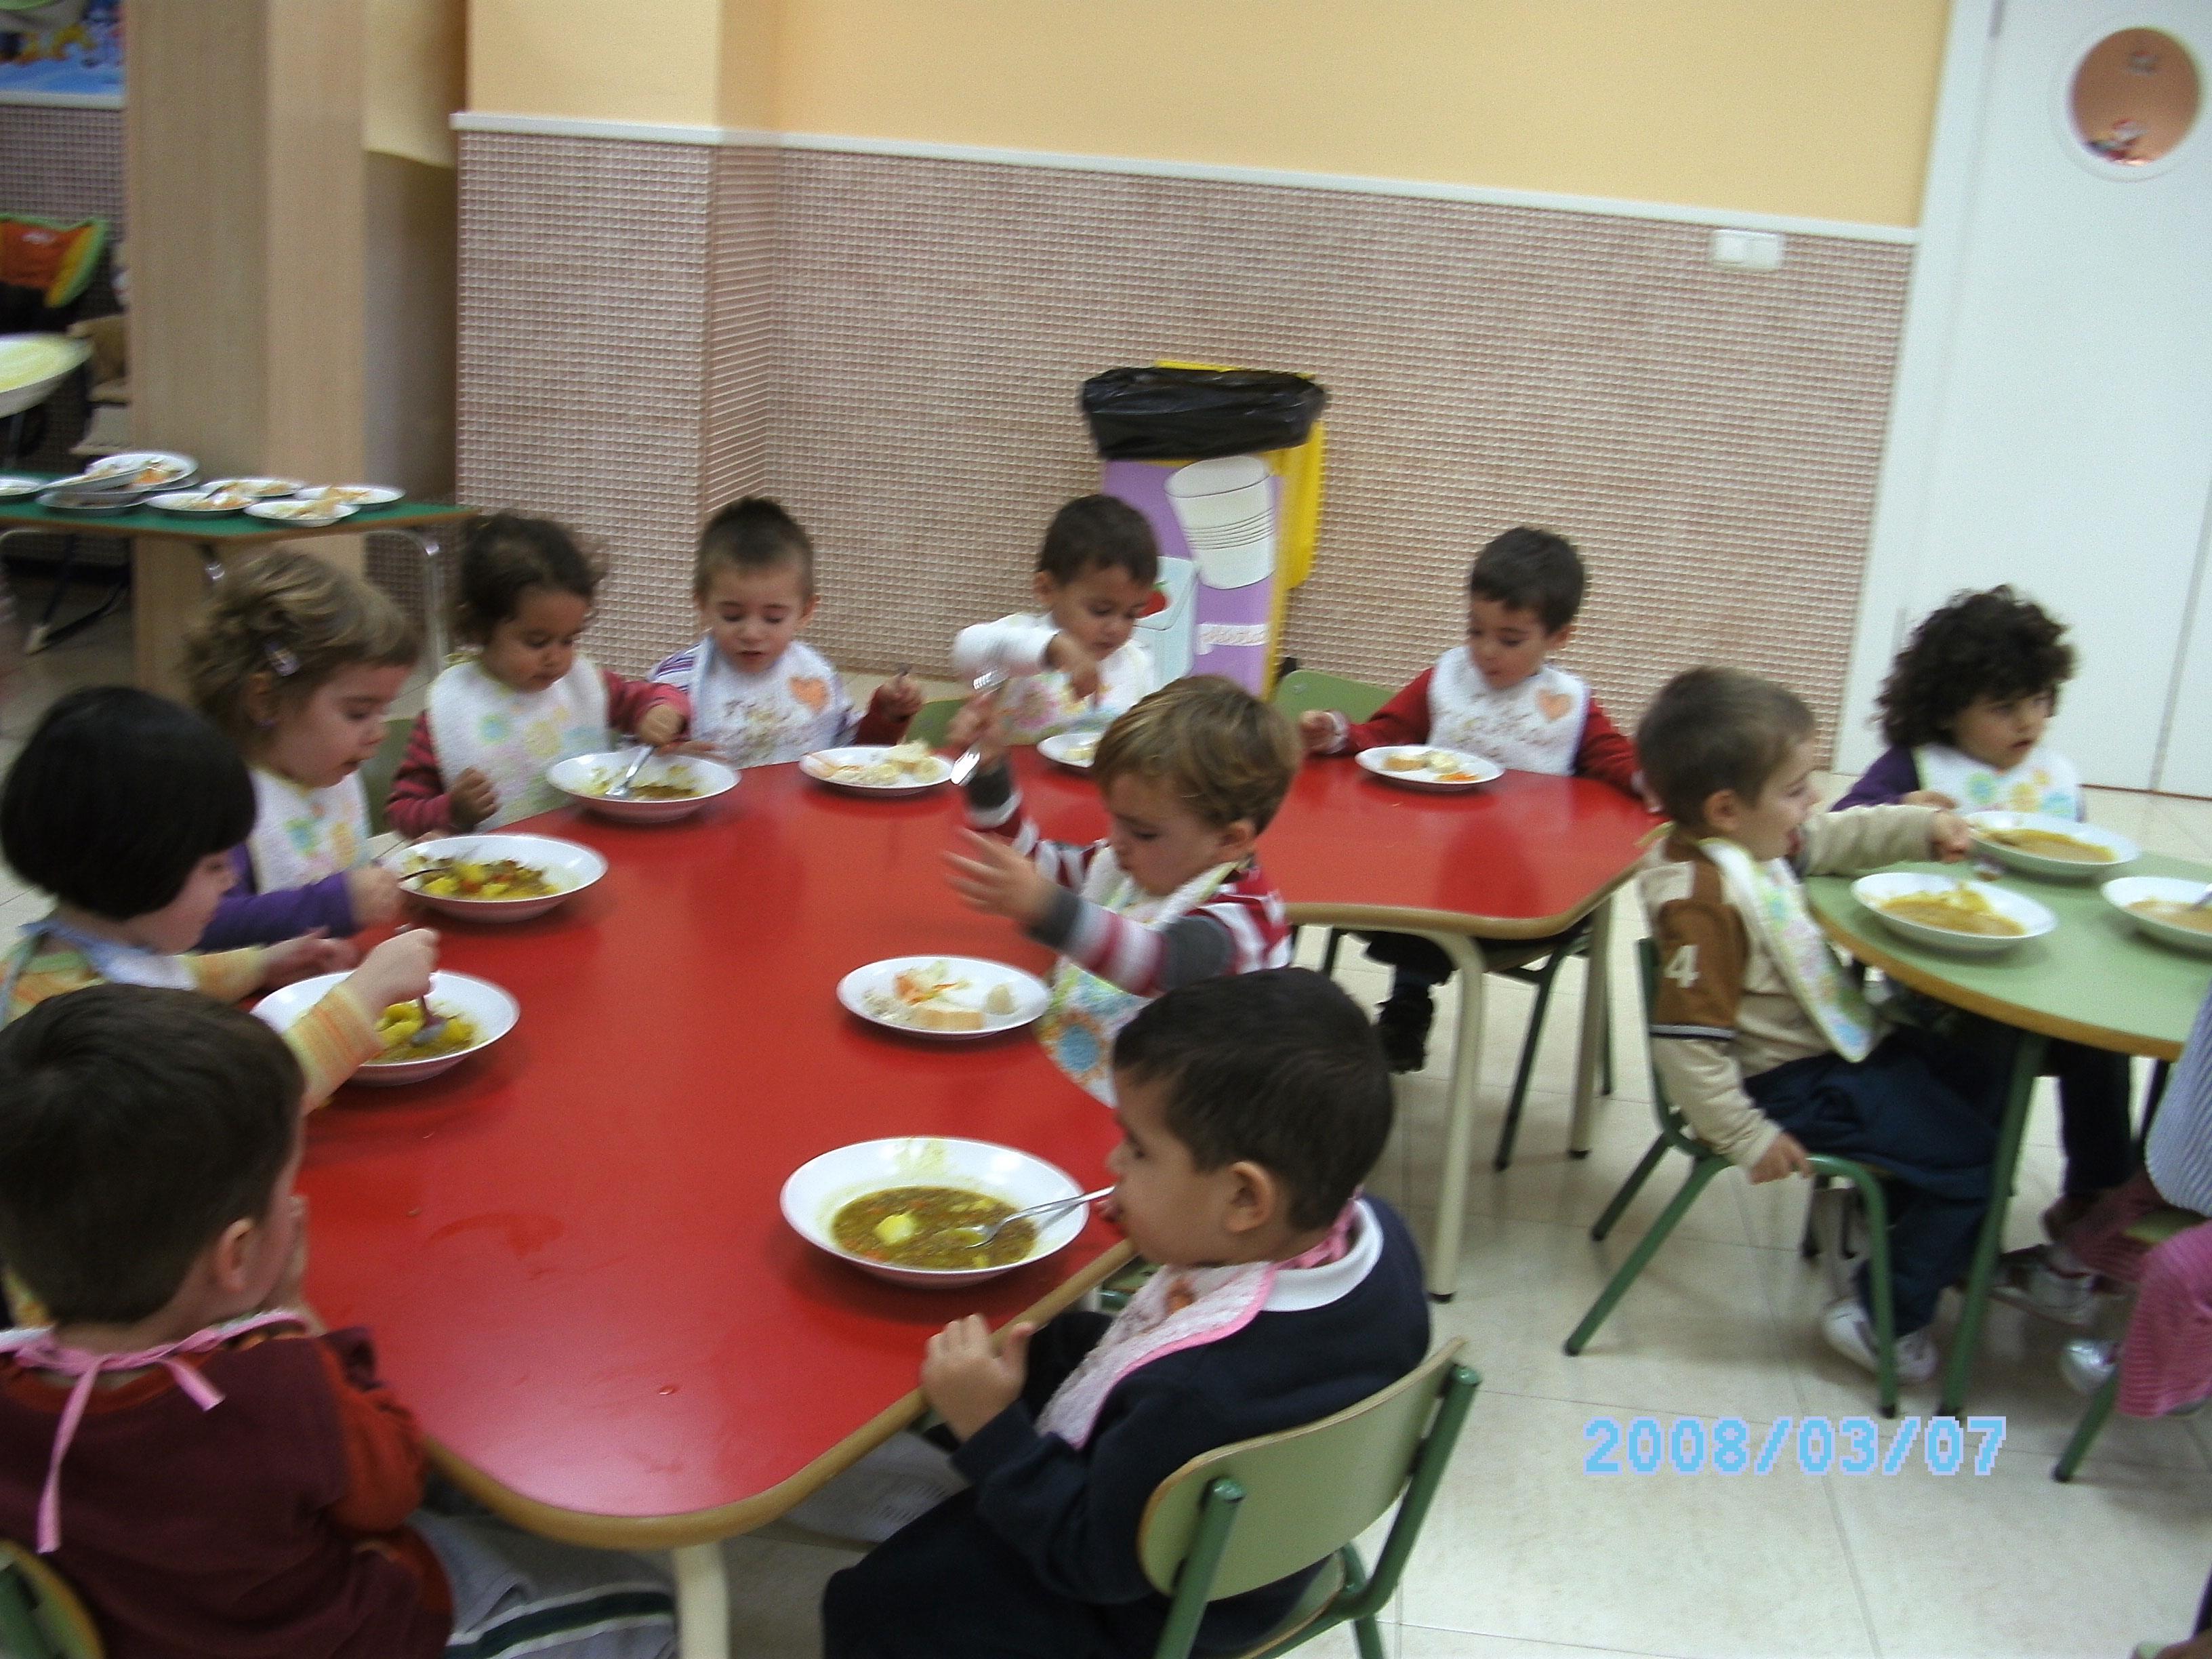 Escuela infantil municipal bambi centros de educaci n for Comedor infantil